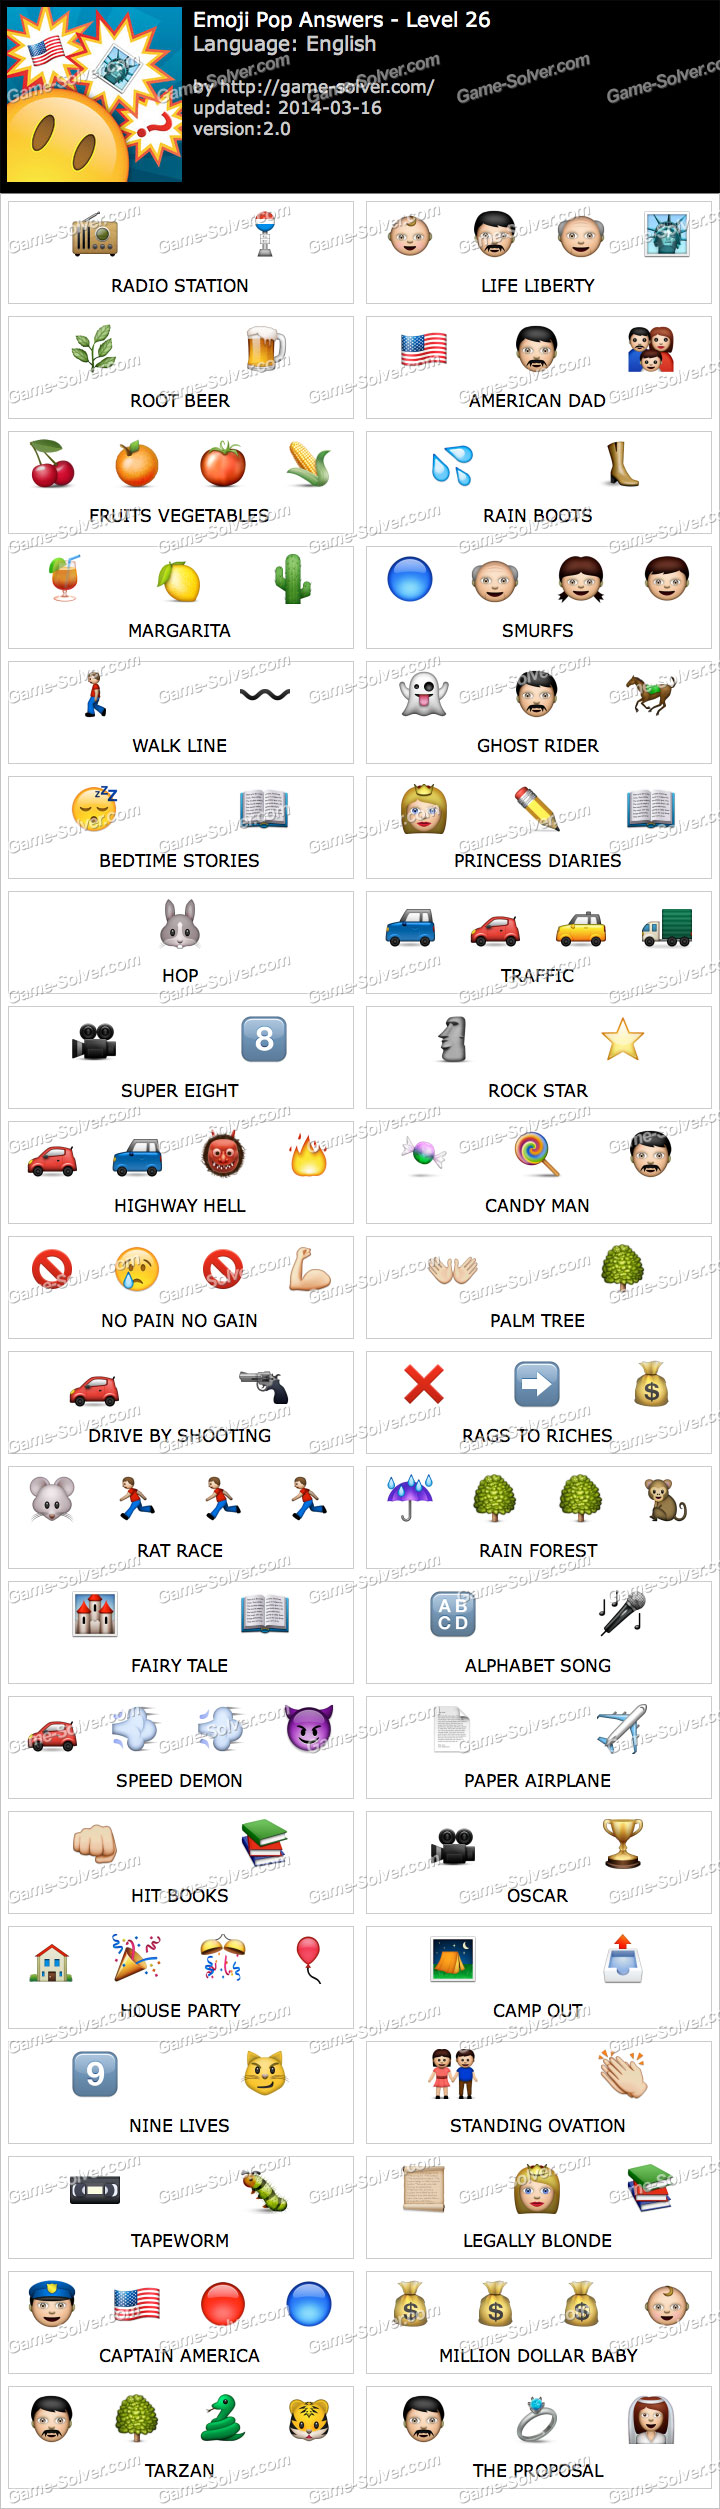 Emoji Pop Level 26 - Game Solver